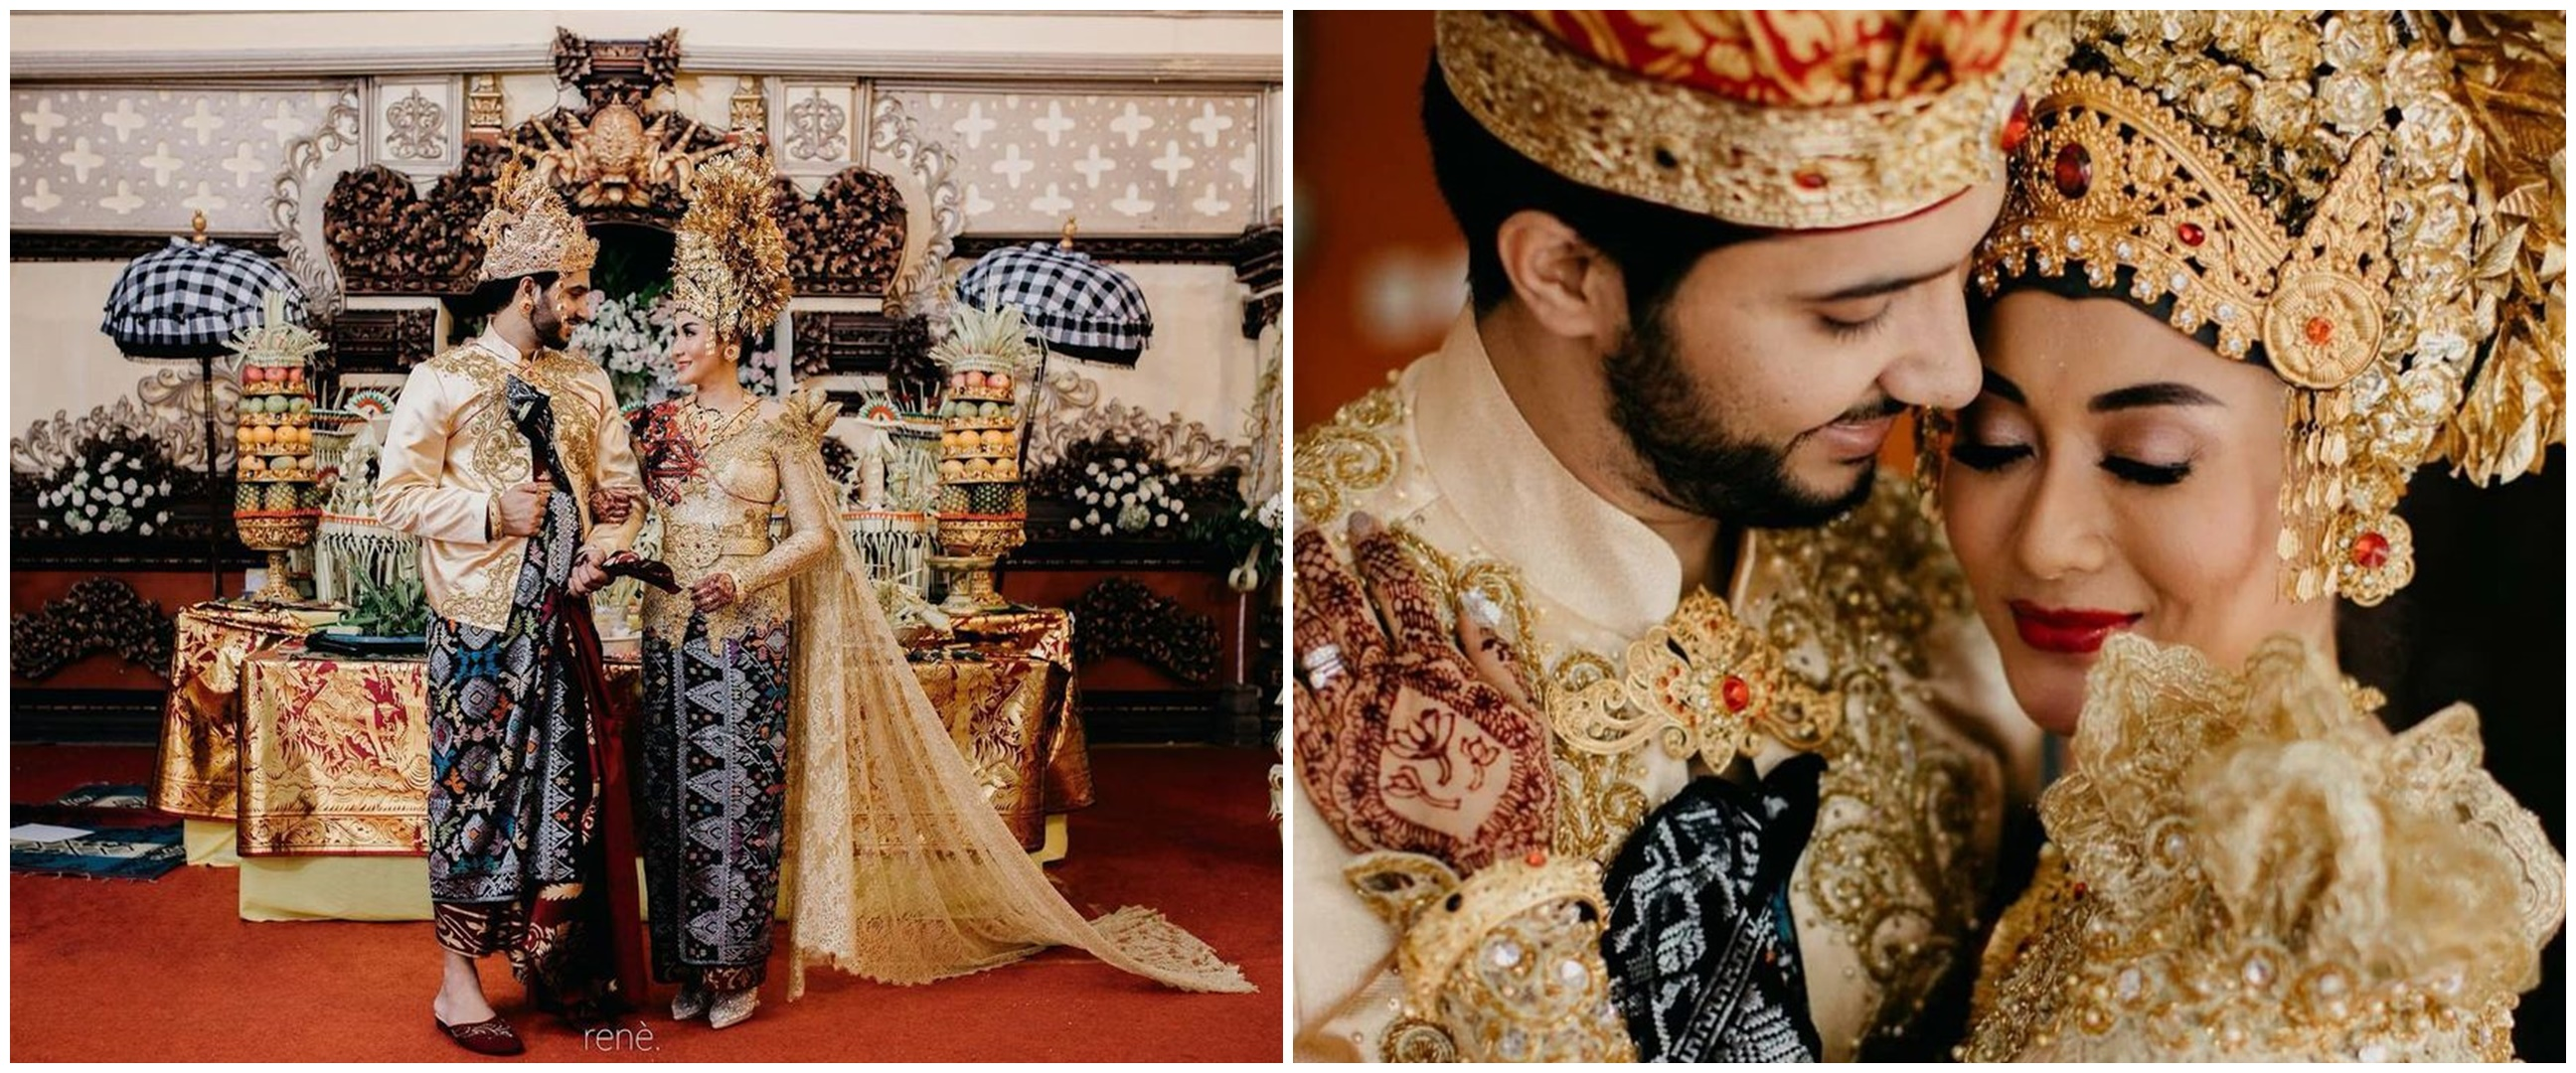 7 Potret pernikahan Gautam 'Chandra Nandini' & Soffie pakai adat Bali